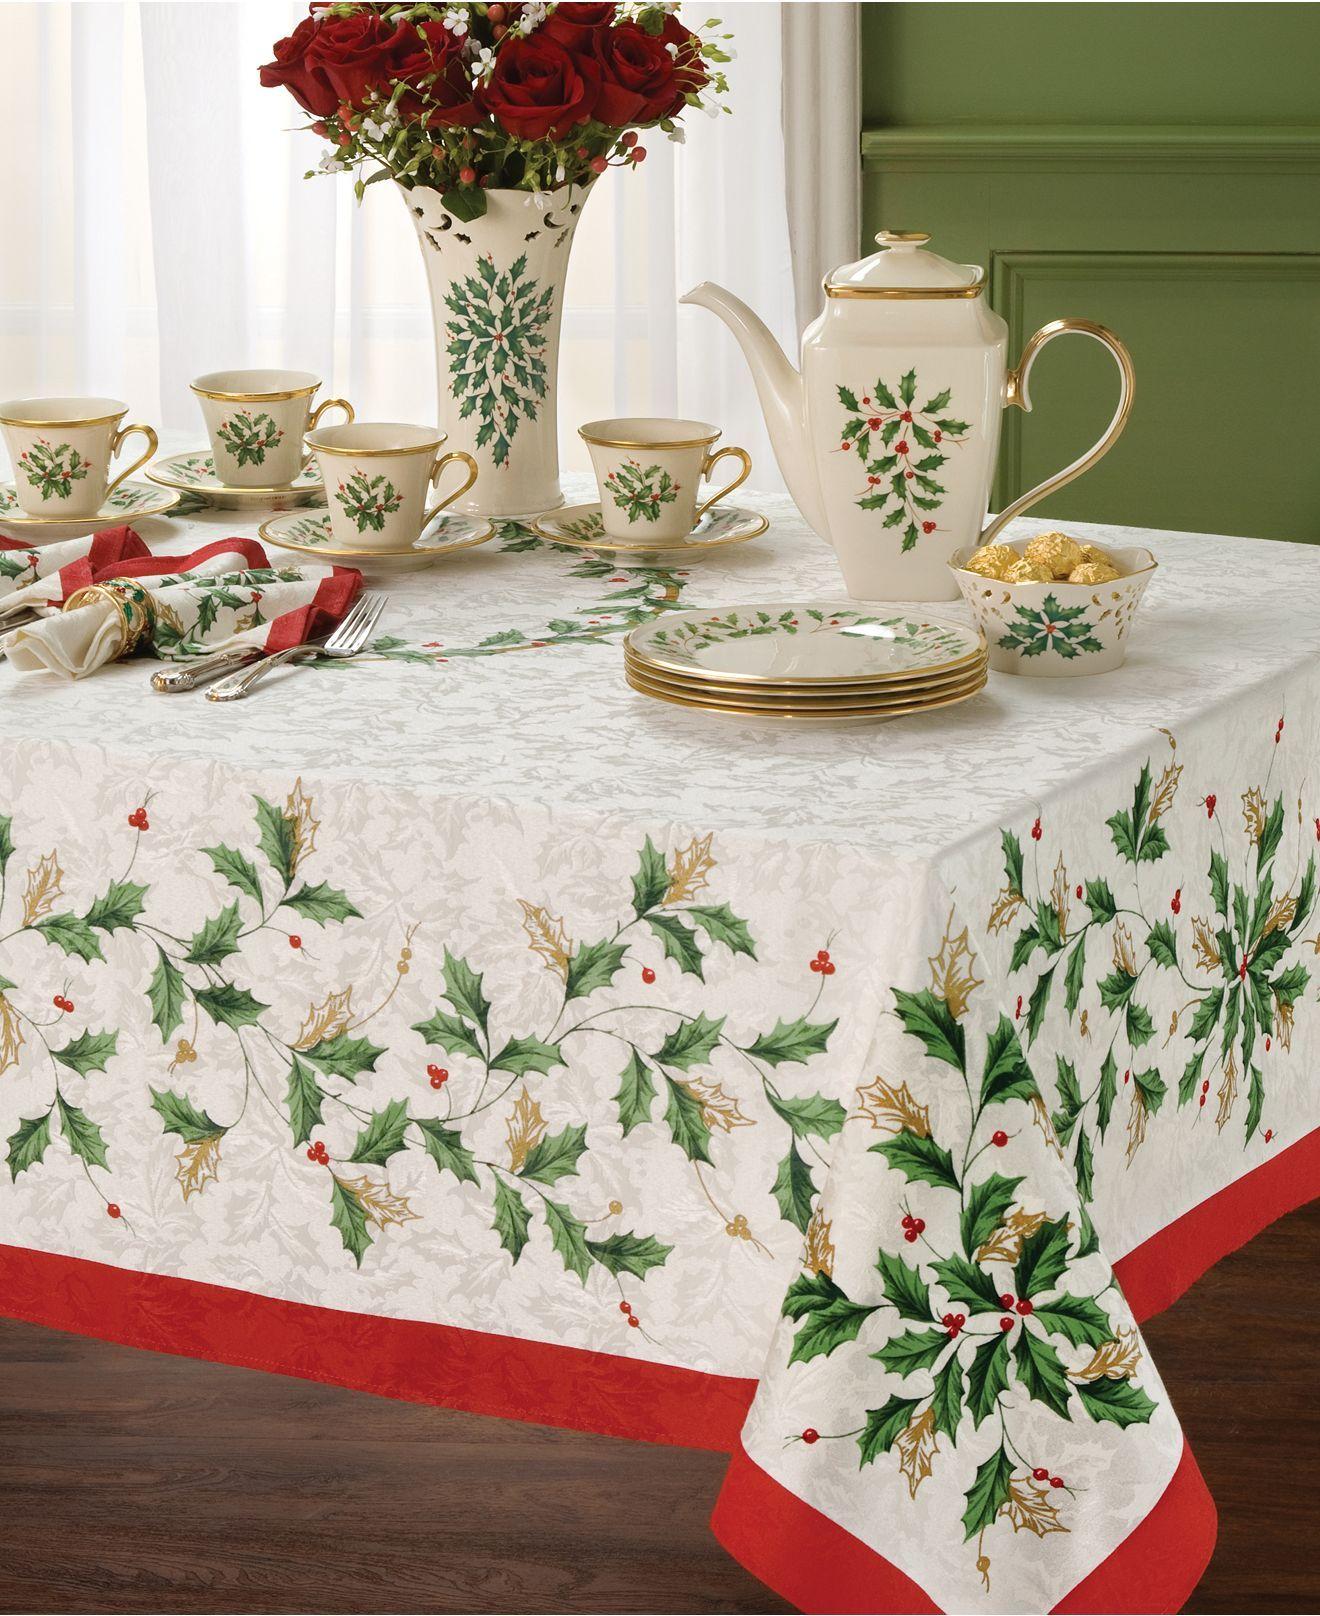 Lenox Holiday China Holiday Table Linens Table Linens